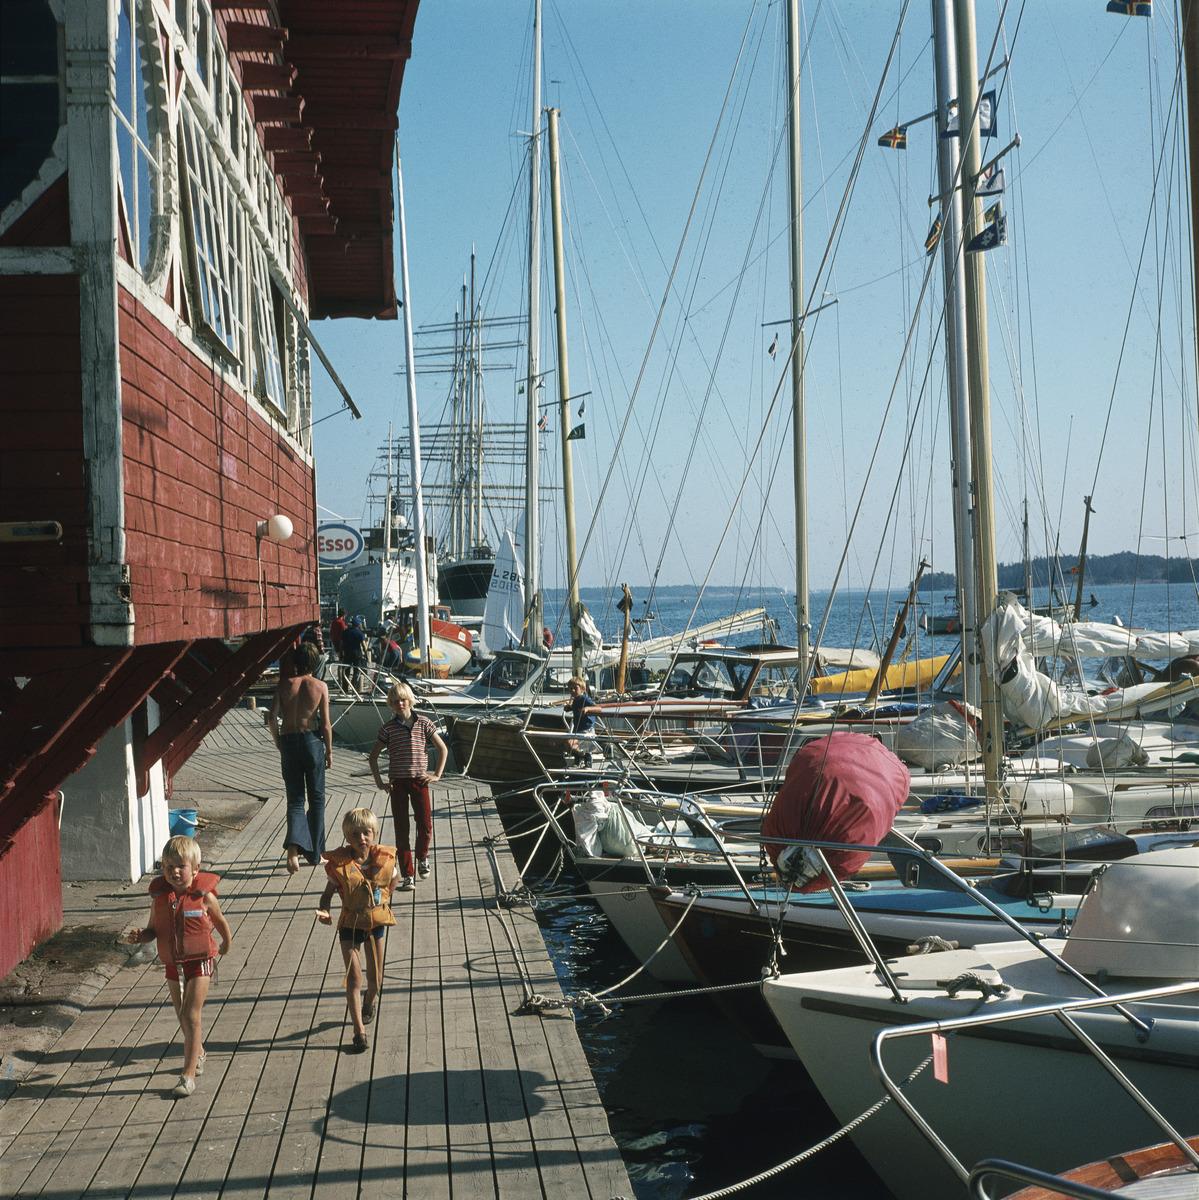 Boat harbor. Photo: Volker von Bonin. Finnish Heritage Agency.